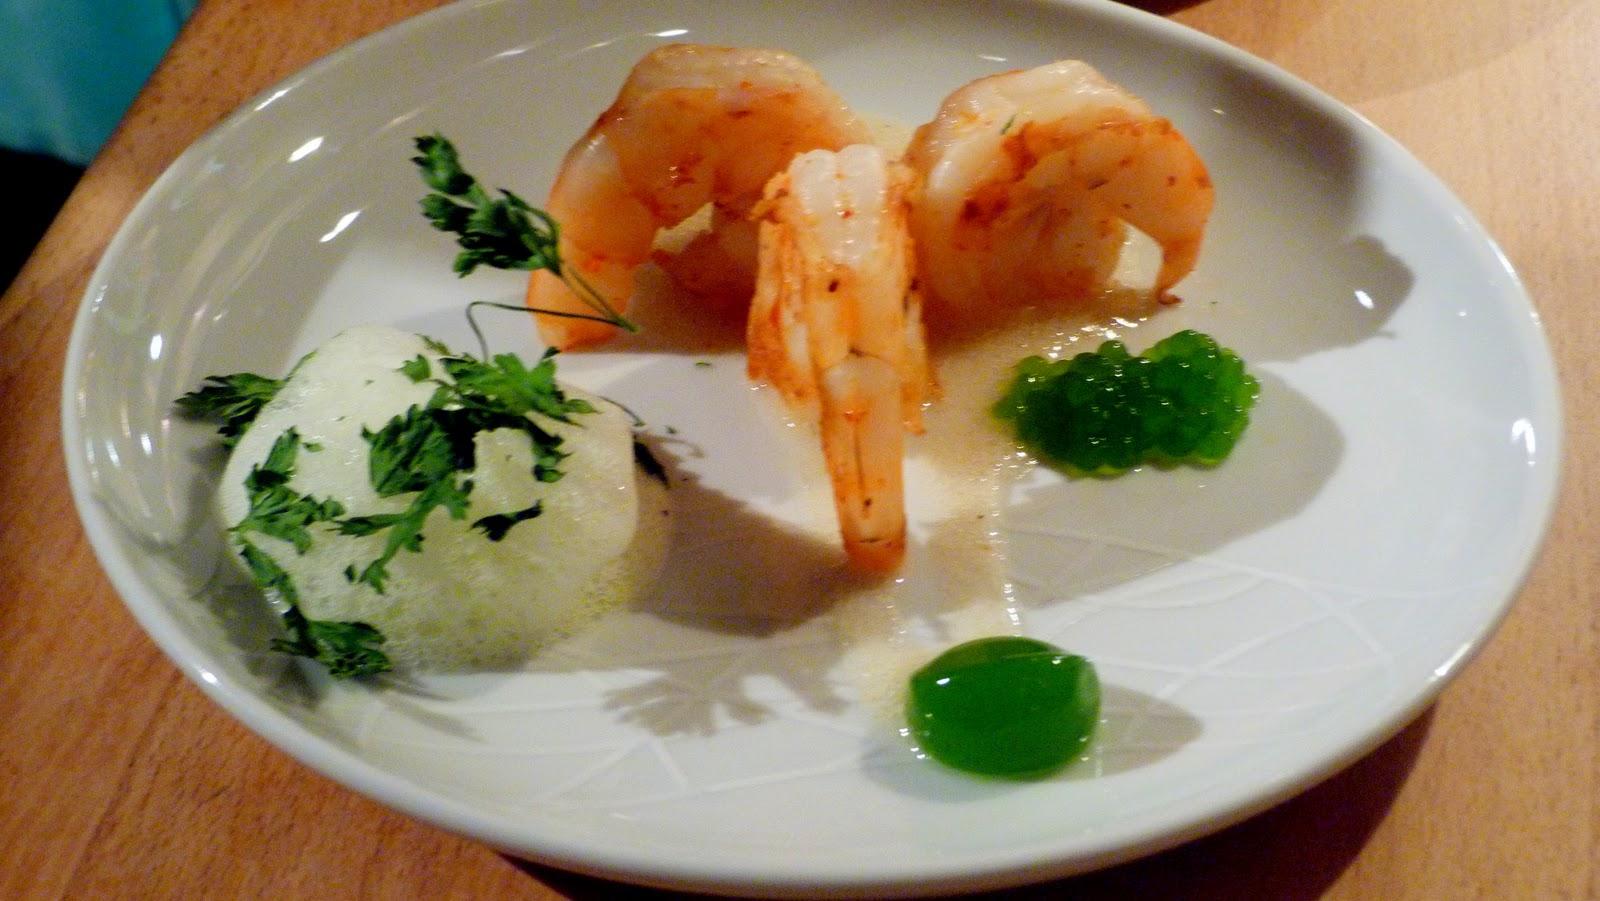 L 39 imperfection d sirable mmmmh cuisine mol culaire un for Cuisine moleculaire